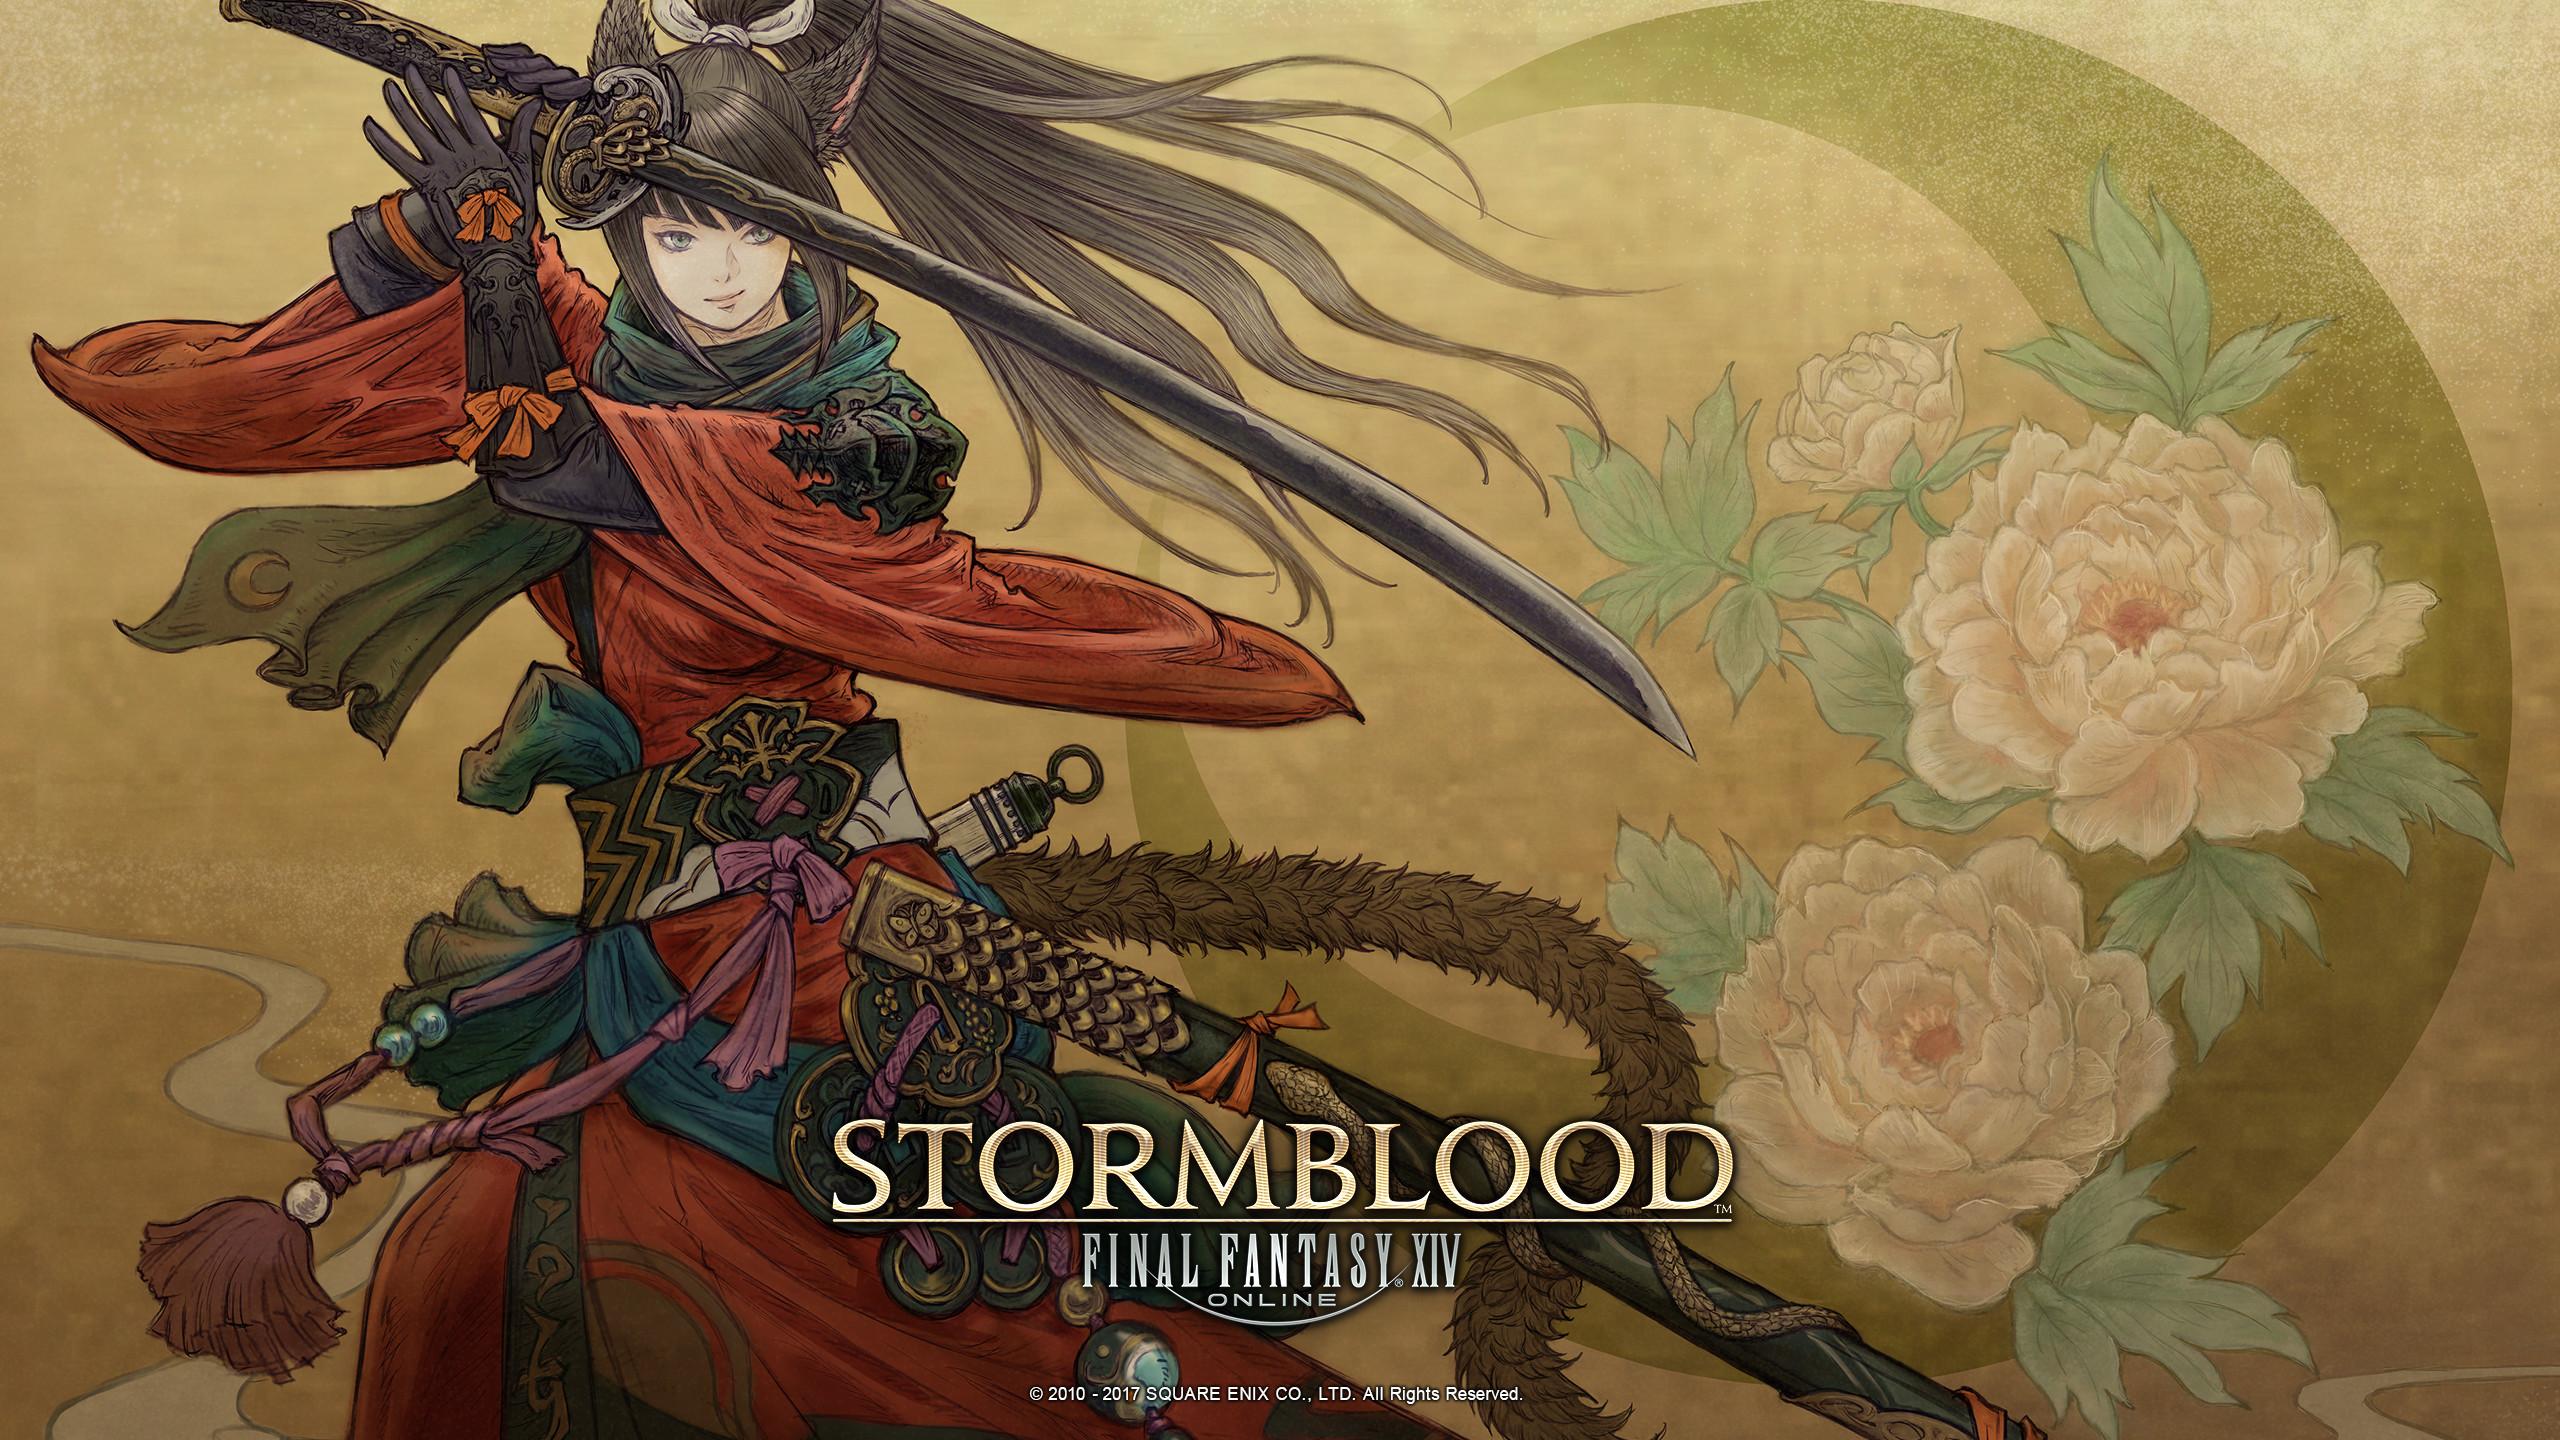 Explore Samurai Artwork, Final Fantasy Xiv, and more!